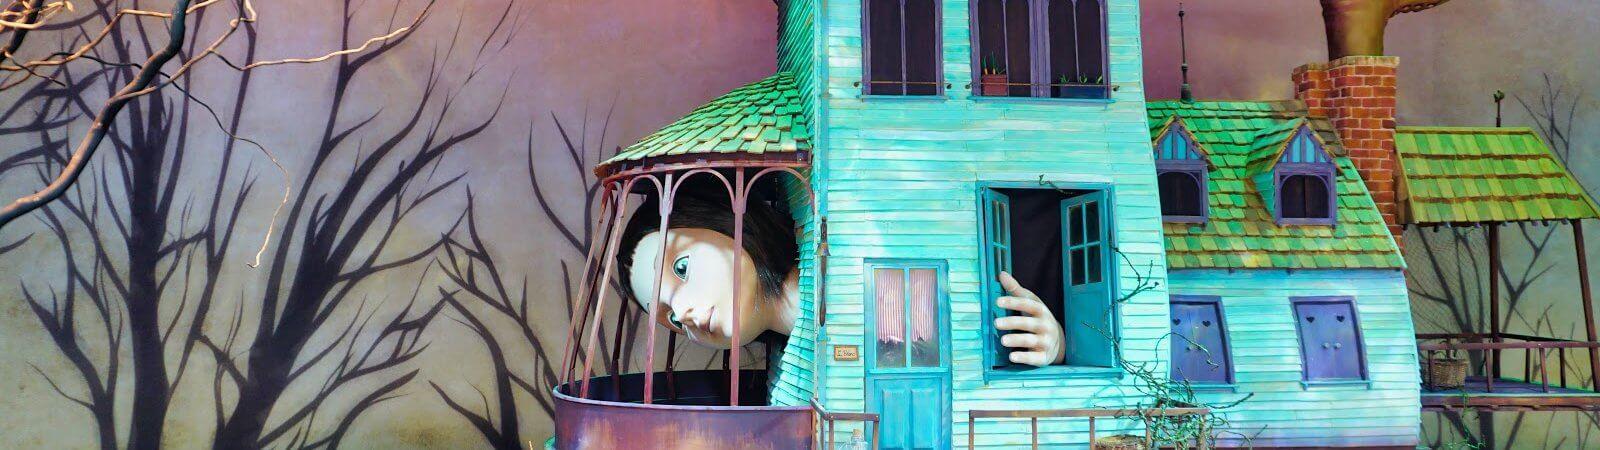 HOT: Myer Christmas Windows 2018 – Alice In Wonderland, Melbourne